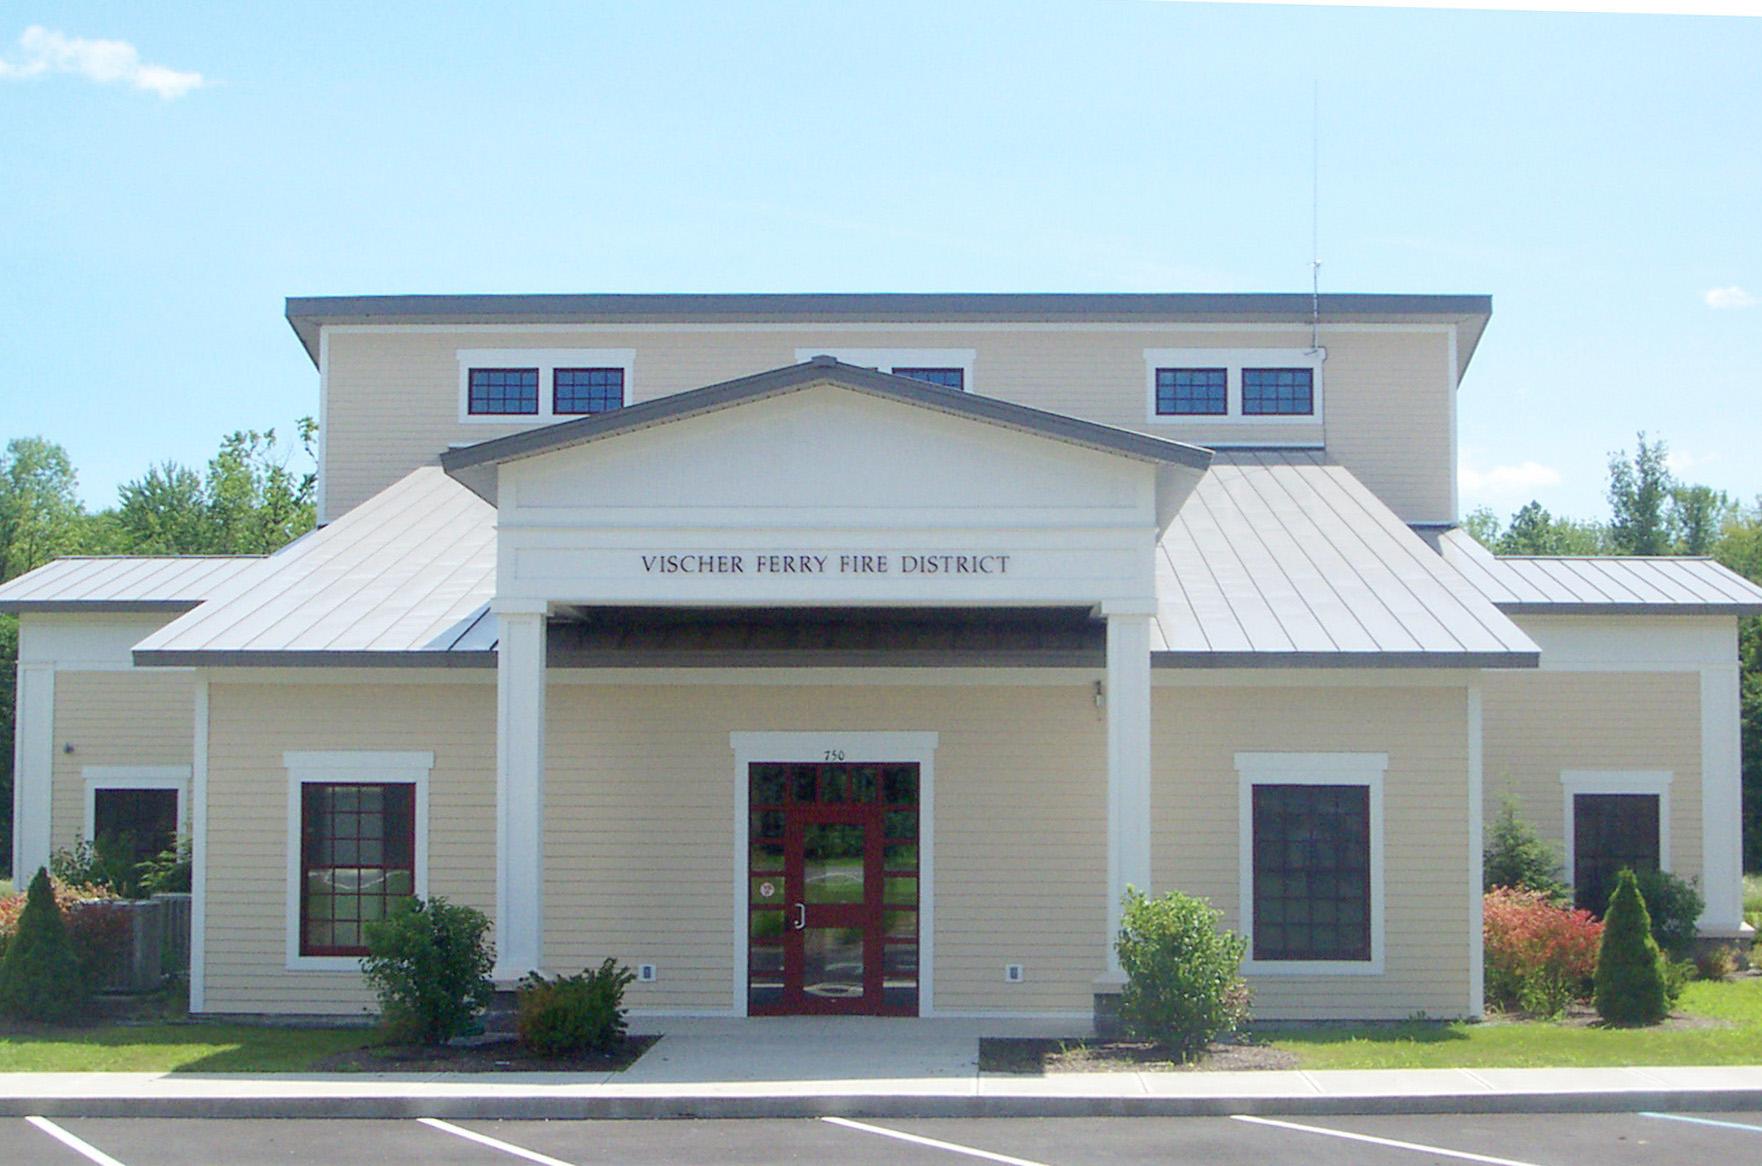 Vischer Ferry Fire District